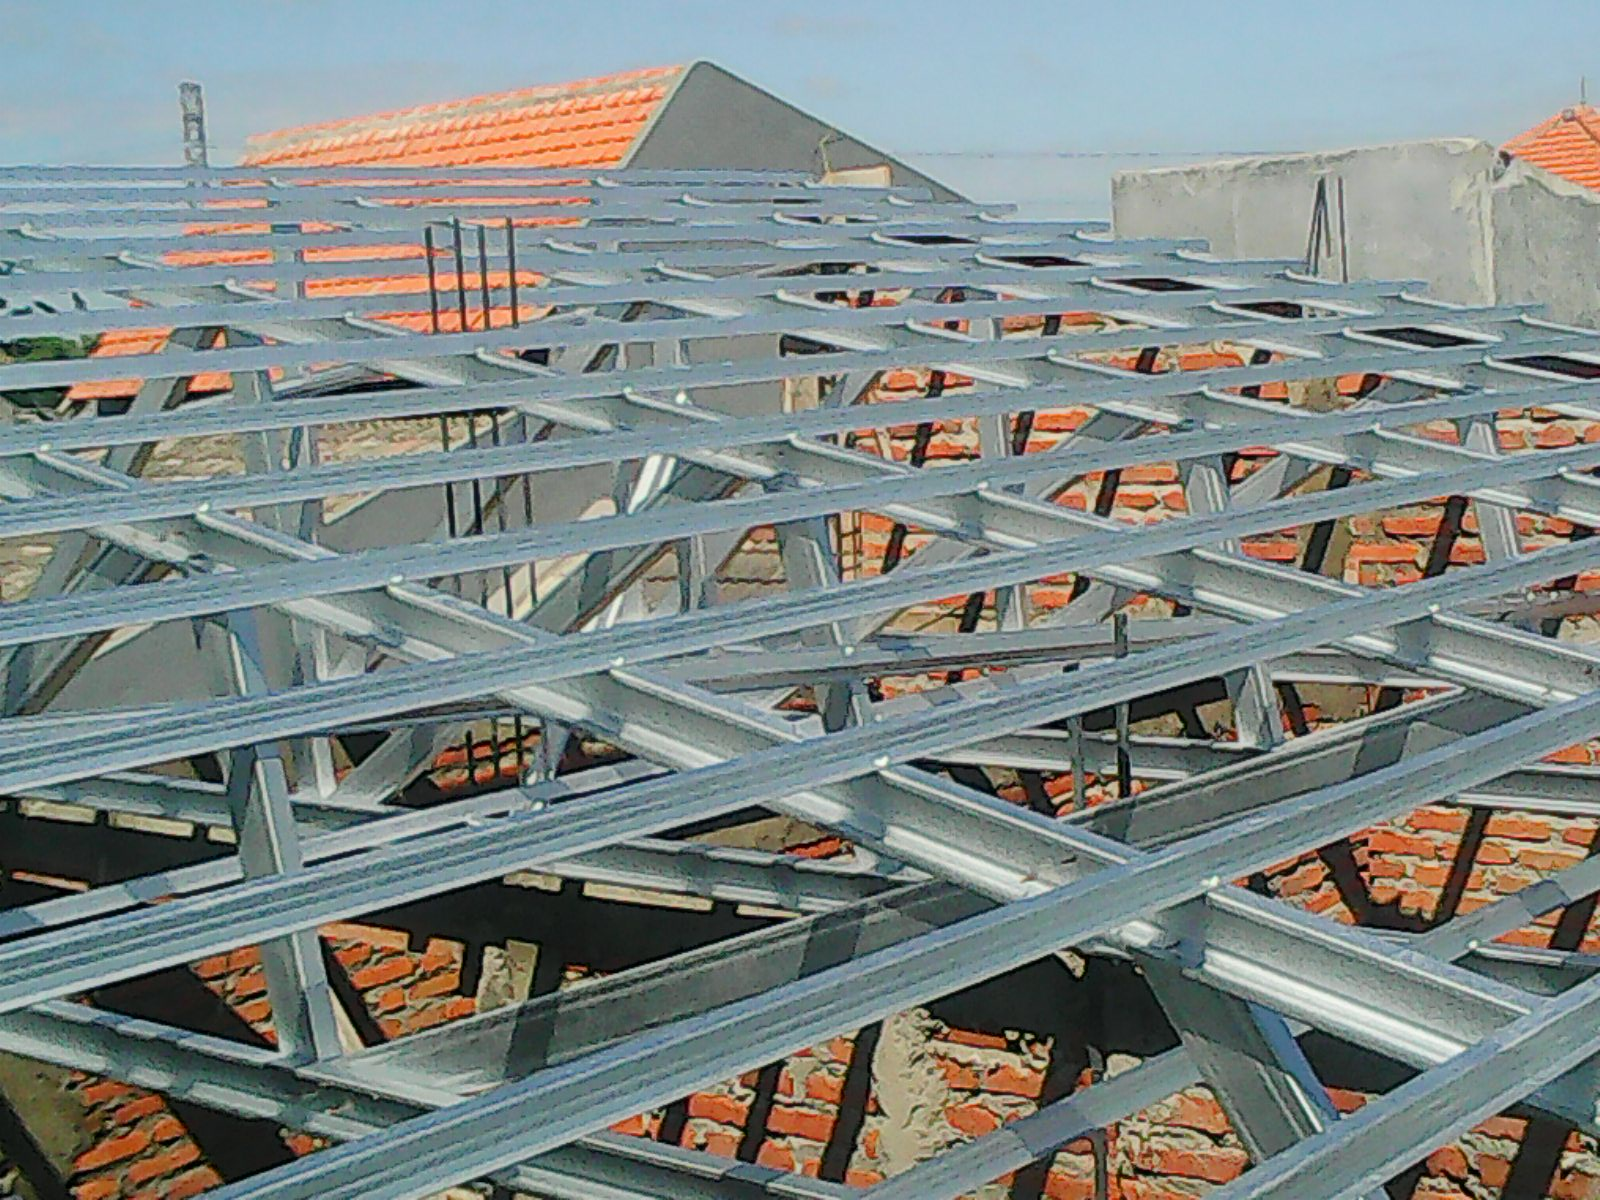 toko athiya gypsum & baja ringan kabupaten kudus jawa tengah pemasangan rangka atap galvalum di perumahan dua